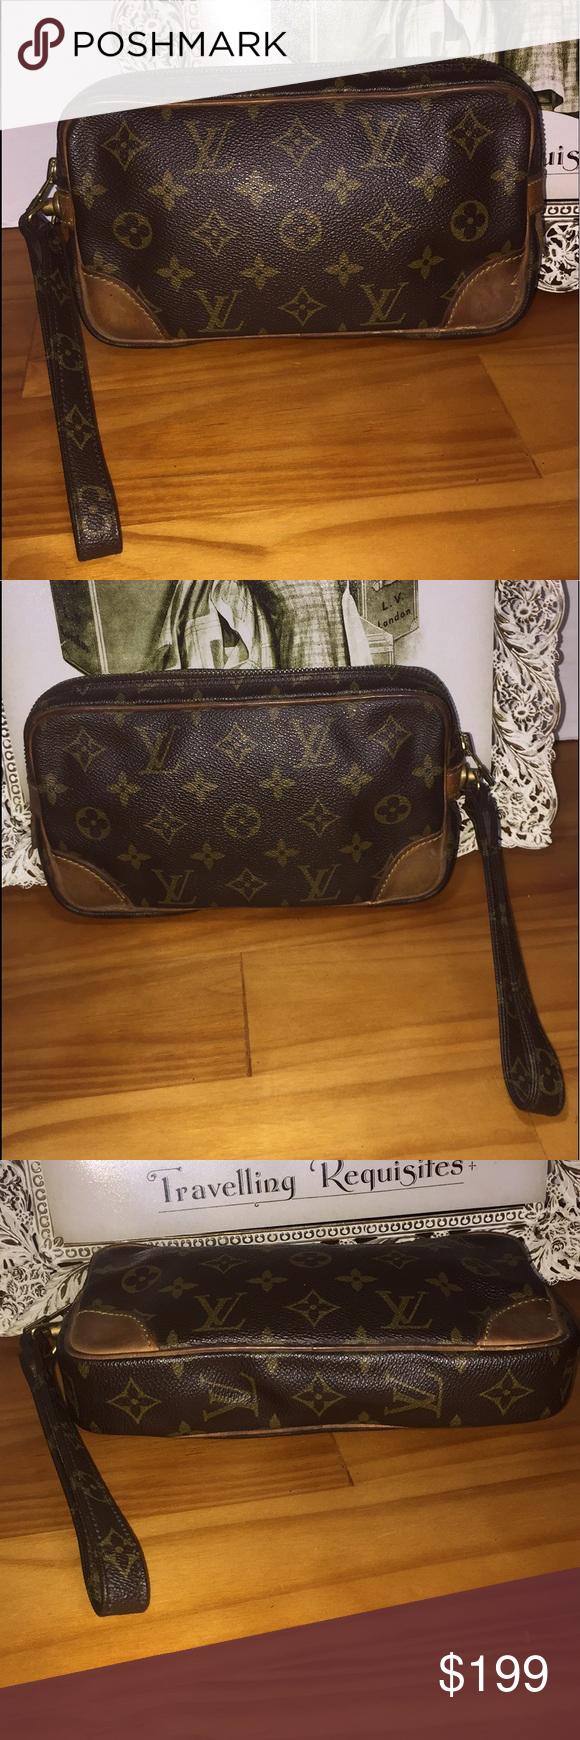 de95c09b5294 Authentic Louis Vuitton Marly Dragonne PM Clutch Authentic Pre-owned Marly  Clutch Bag No cracks